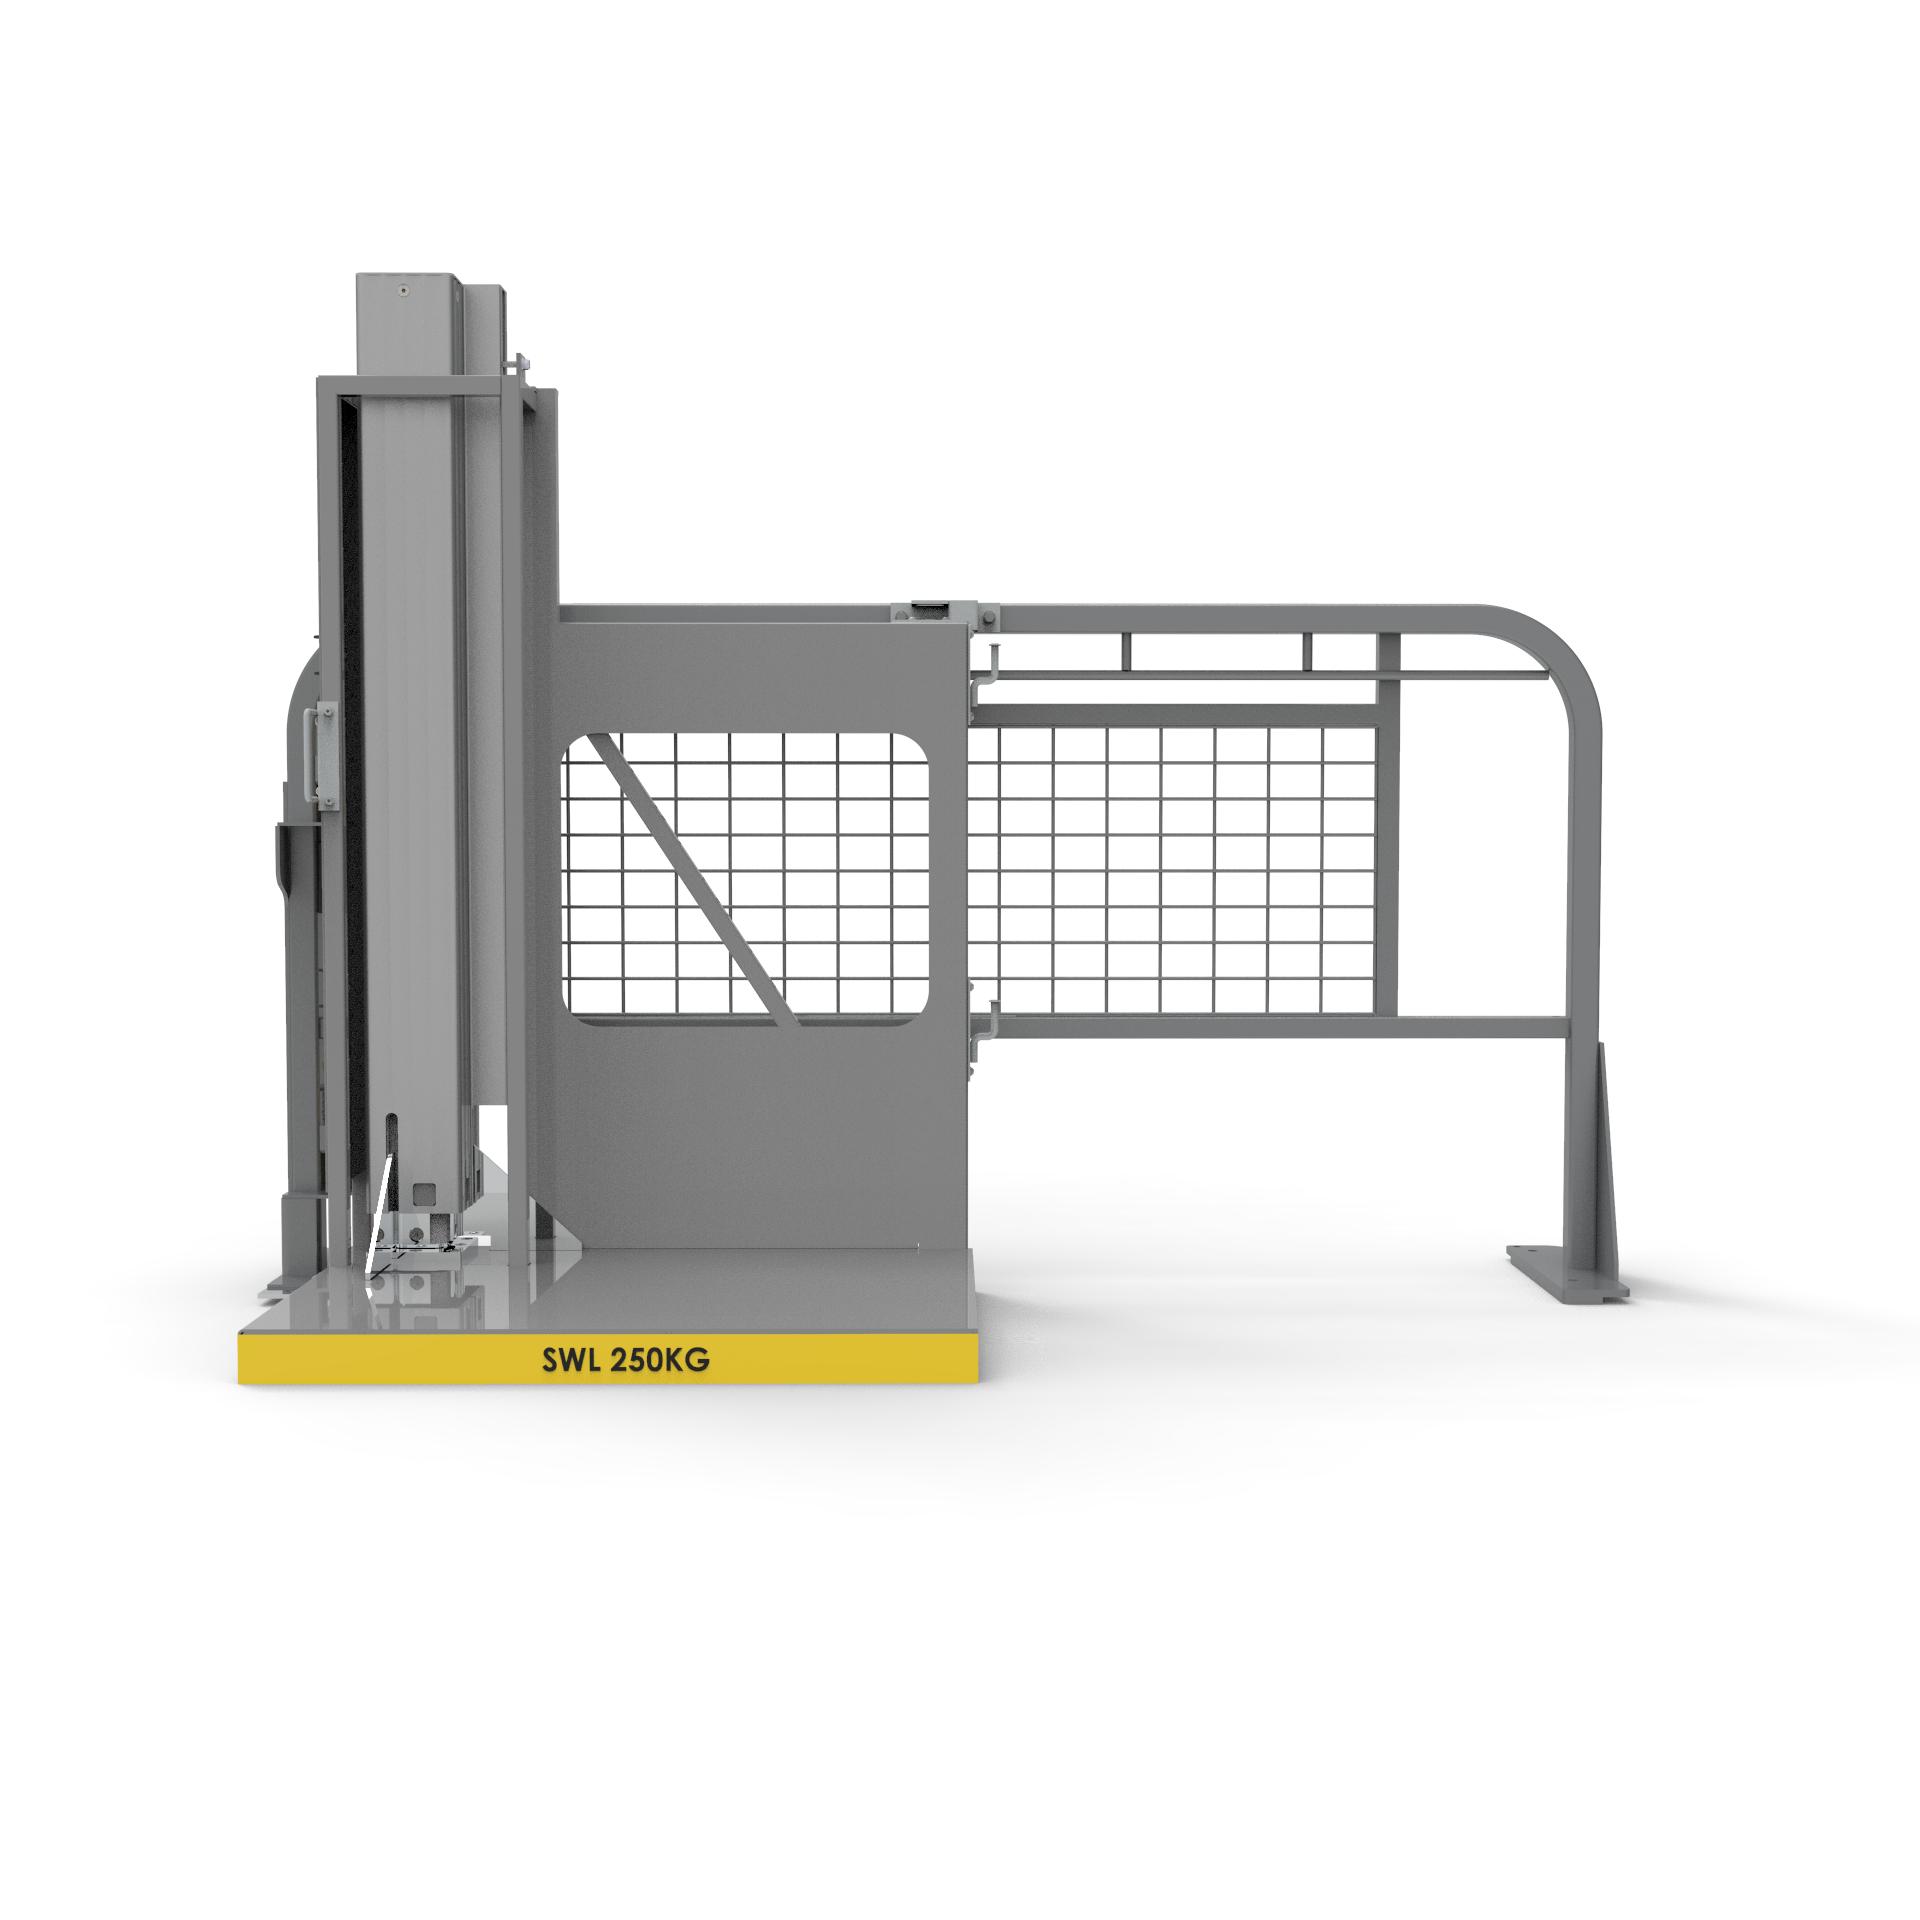 Rear view of EZ Lift-N-Load side lifter